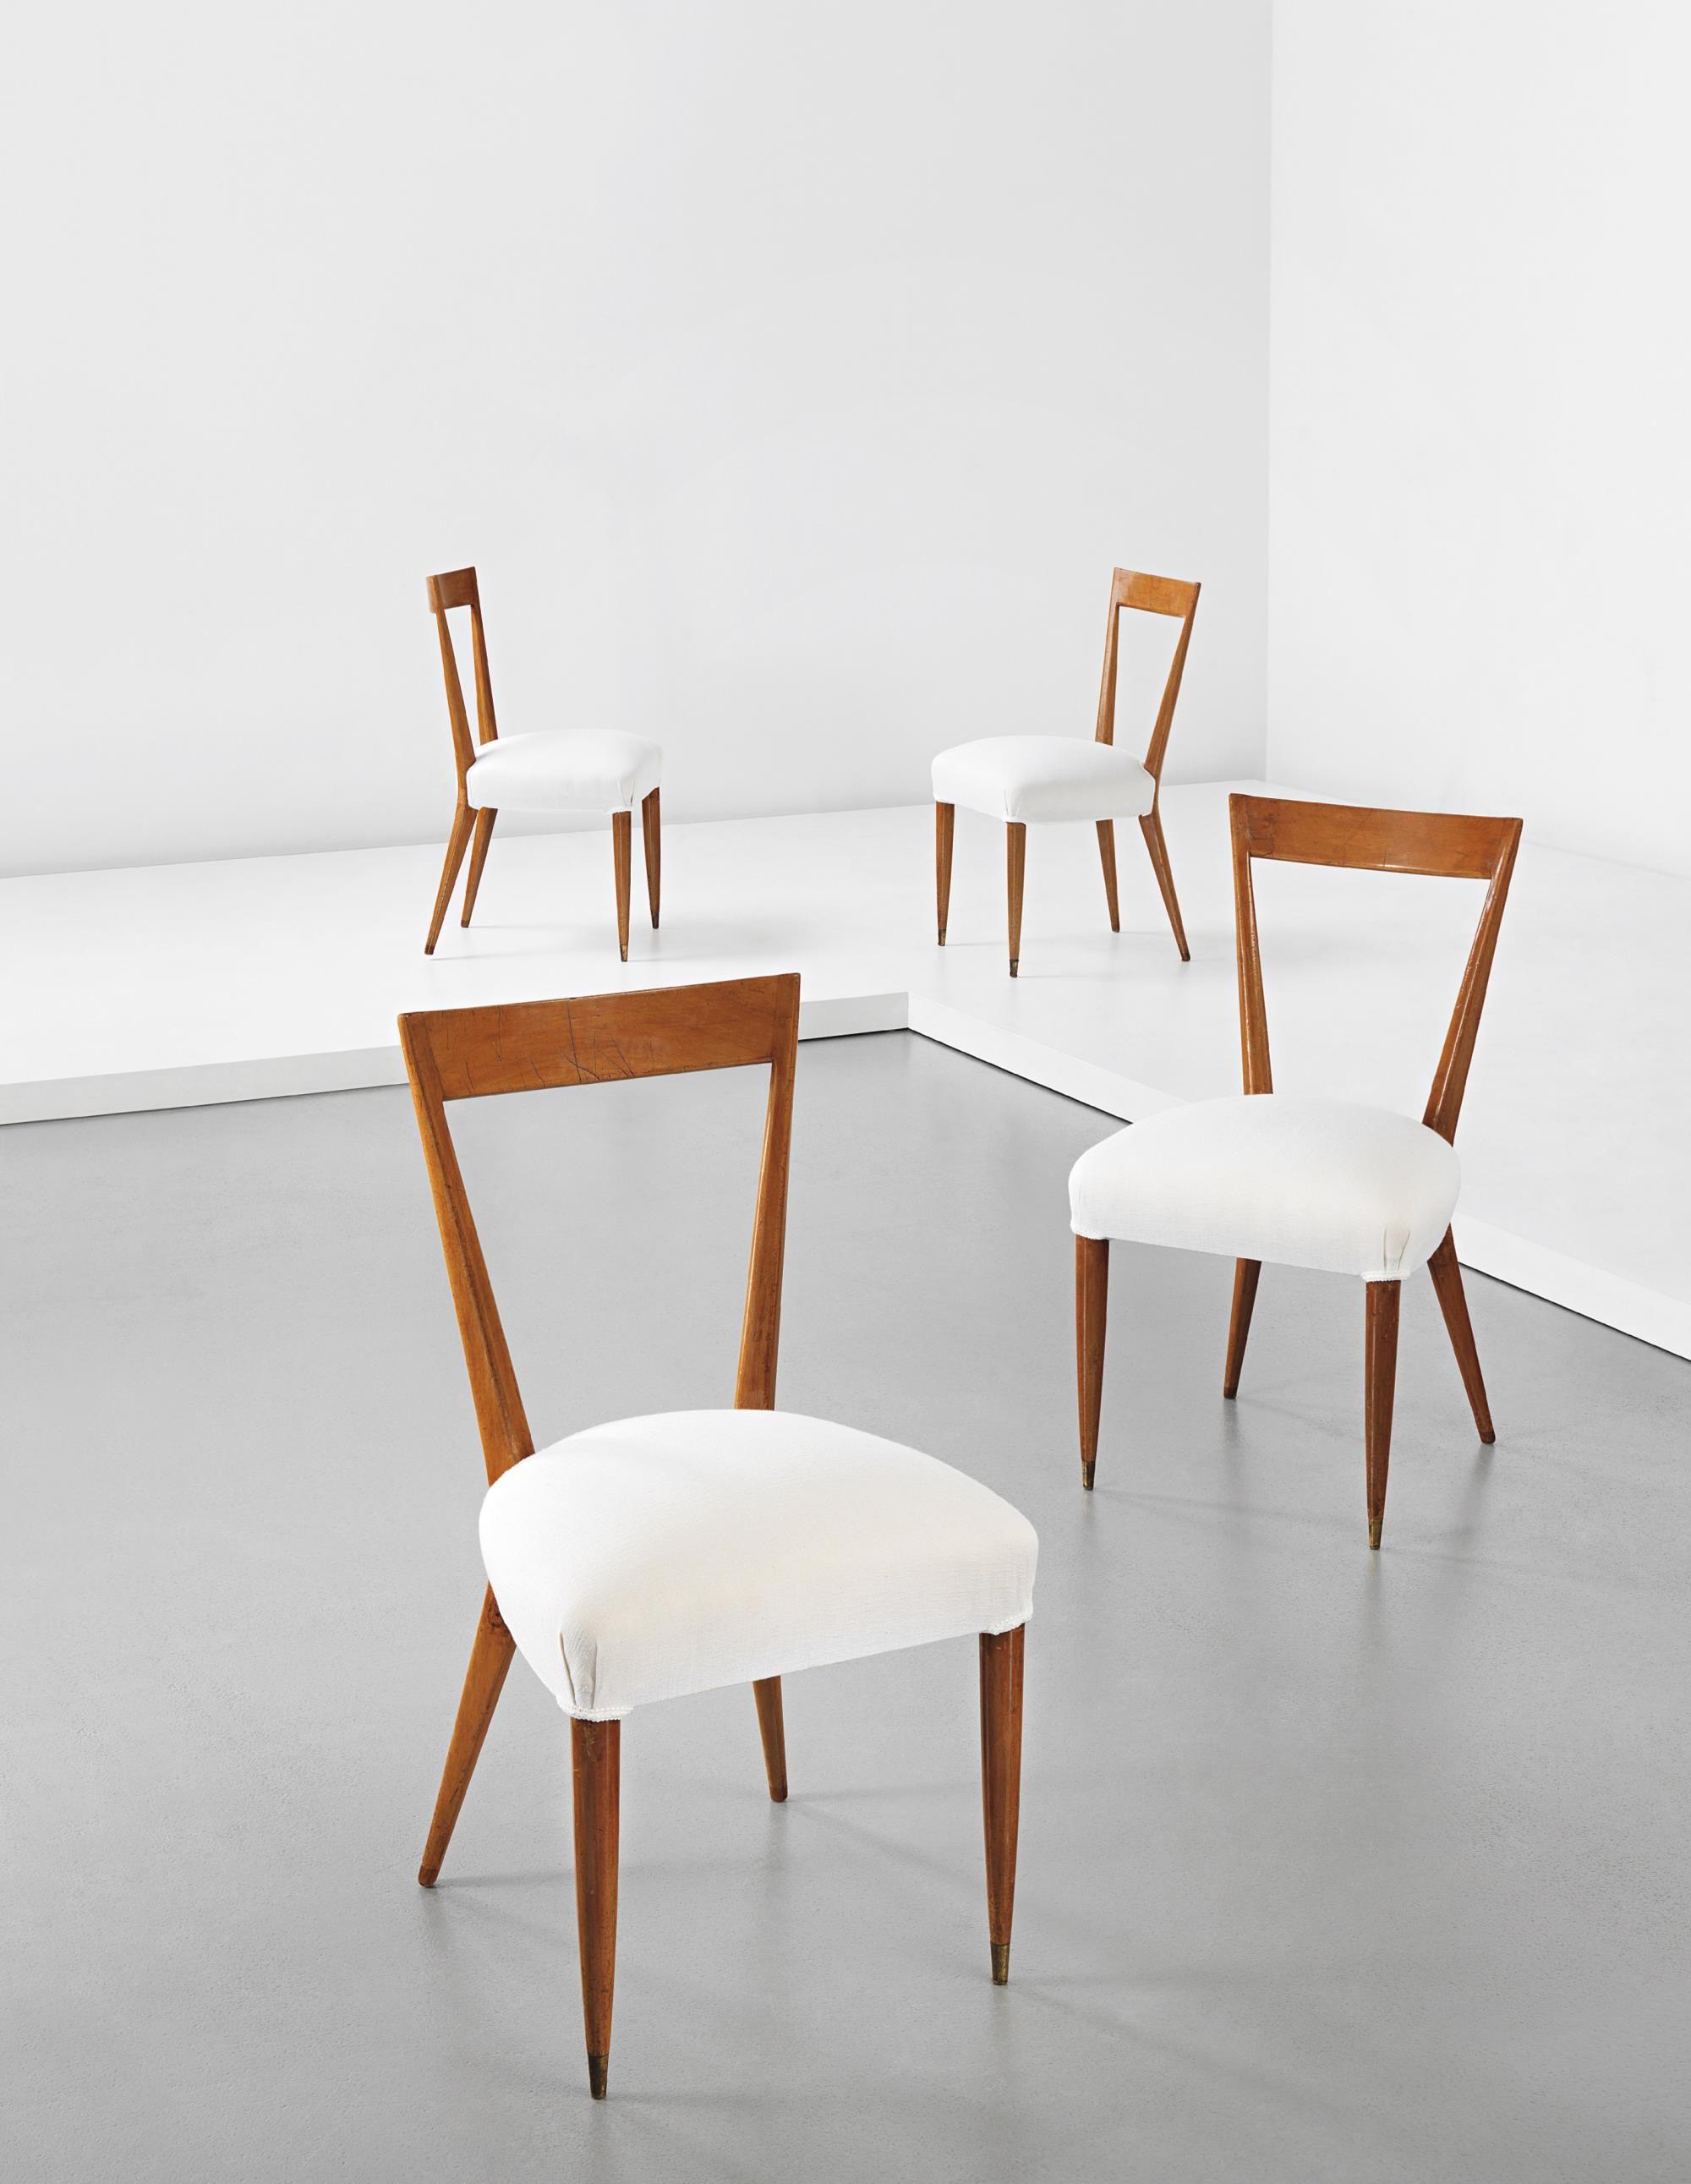 Gio Ponti Set Of Four Dining Chairs Circa 1940s Fabric Walnut Brass Each 34 1 4 X 18 1 4 X 20 3 4 In 87 X 46 4 X 52 7 Cm Dining Chairs Chair Furniture Set of four dining chairs